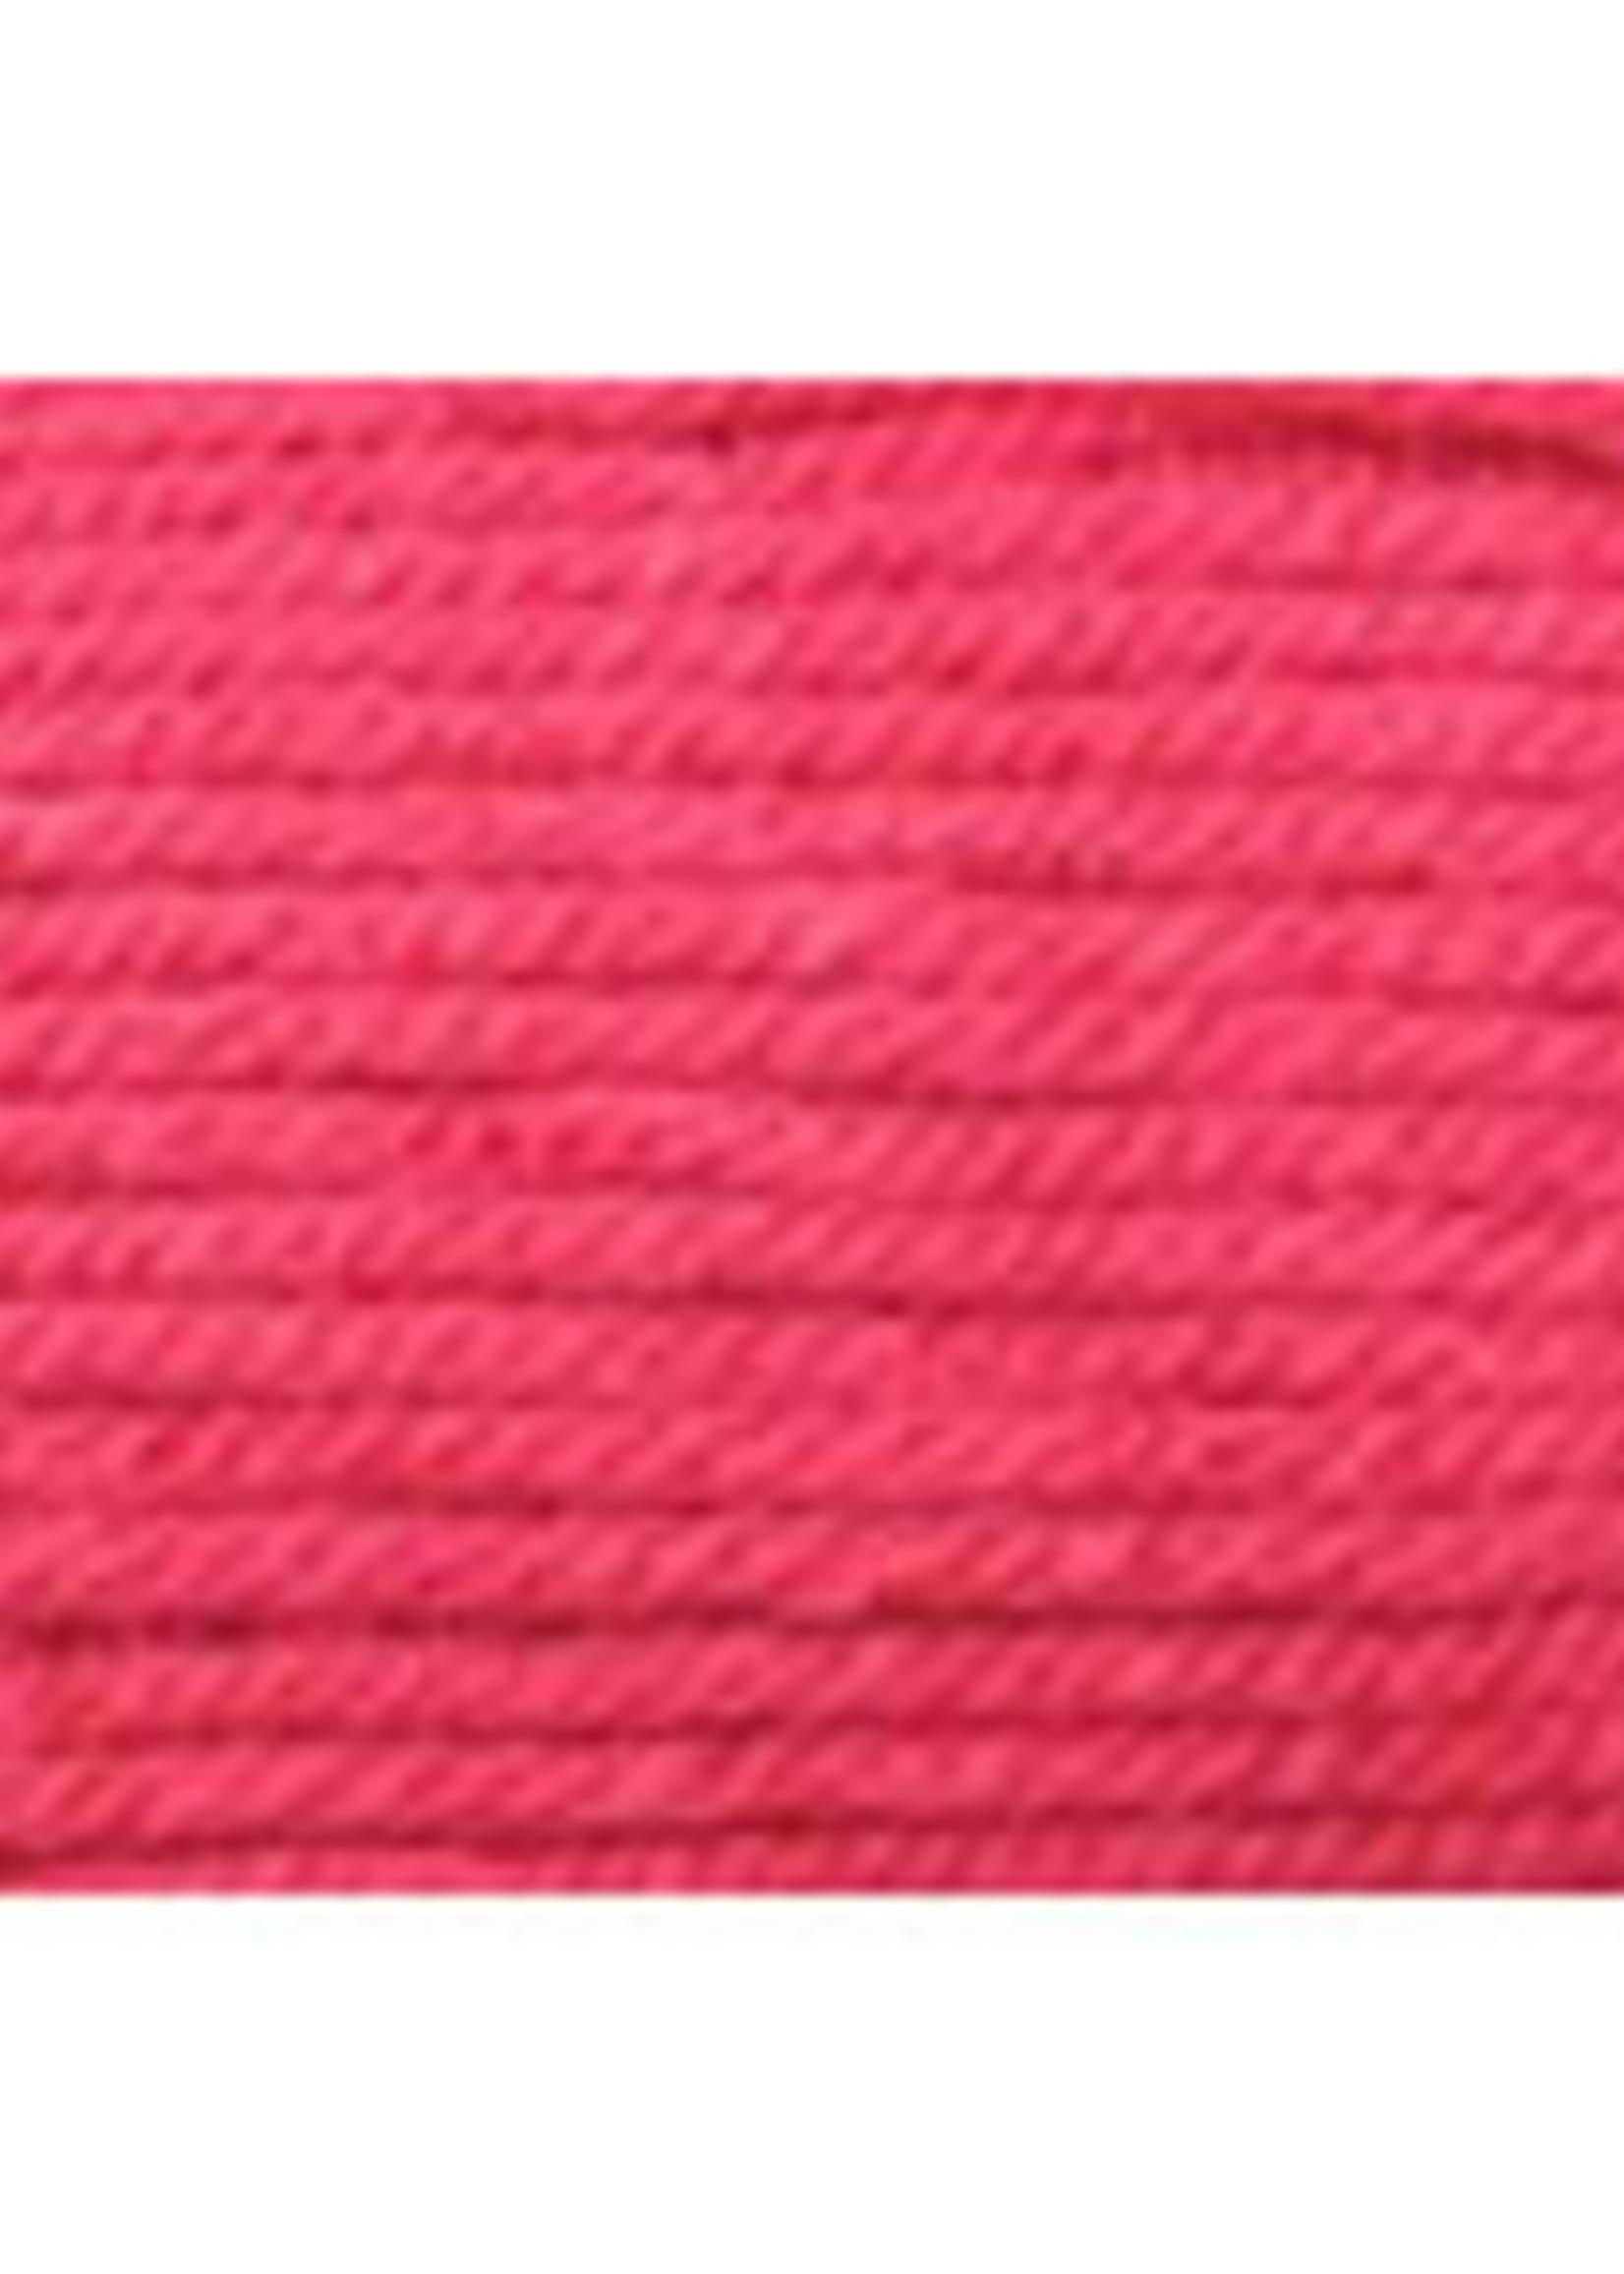 Universal Yarns Universal Yarn Uptown Worsted 326 Blush